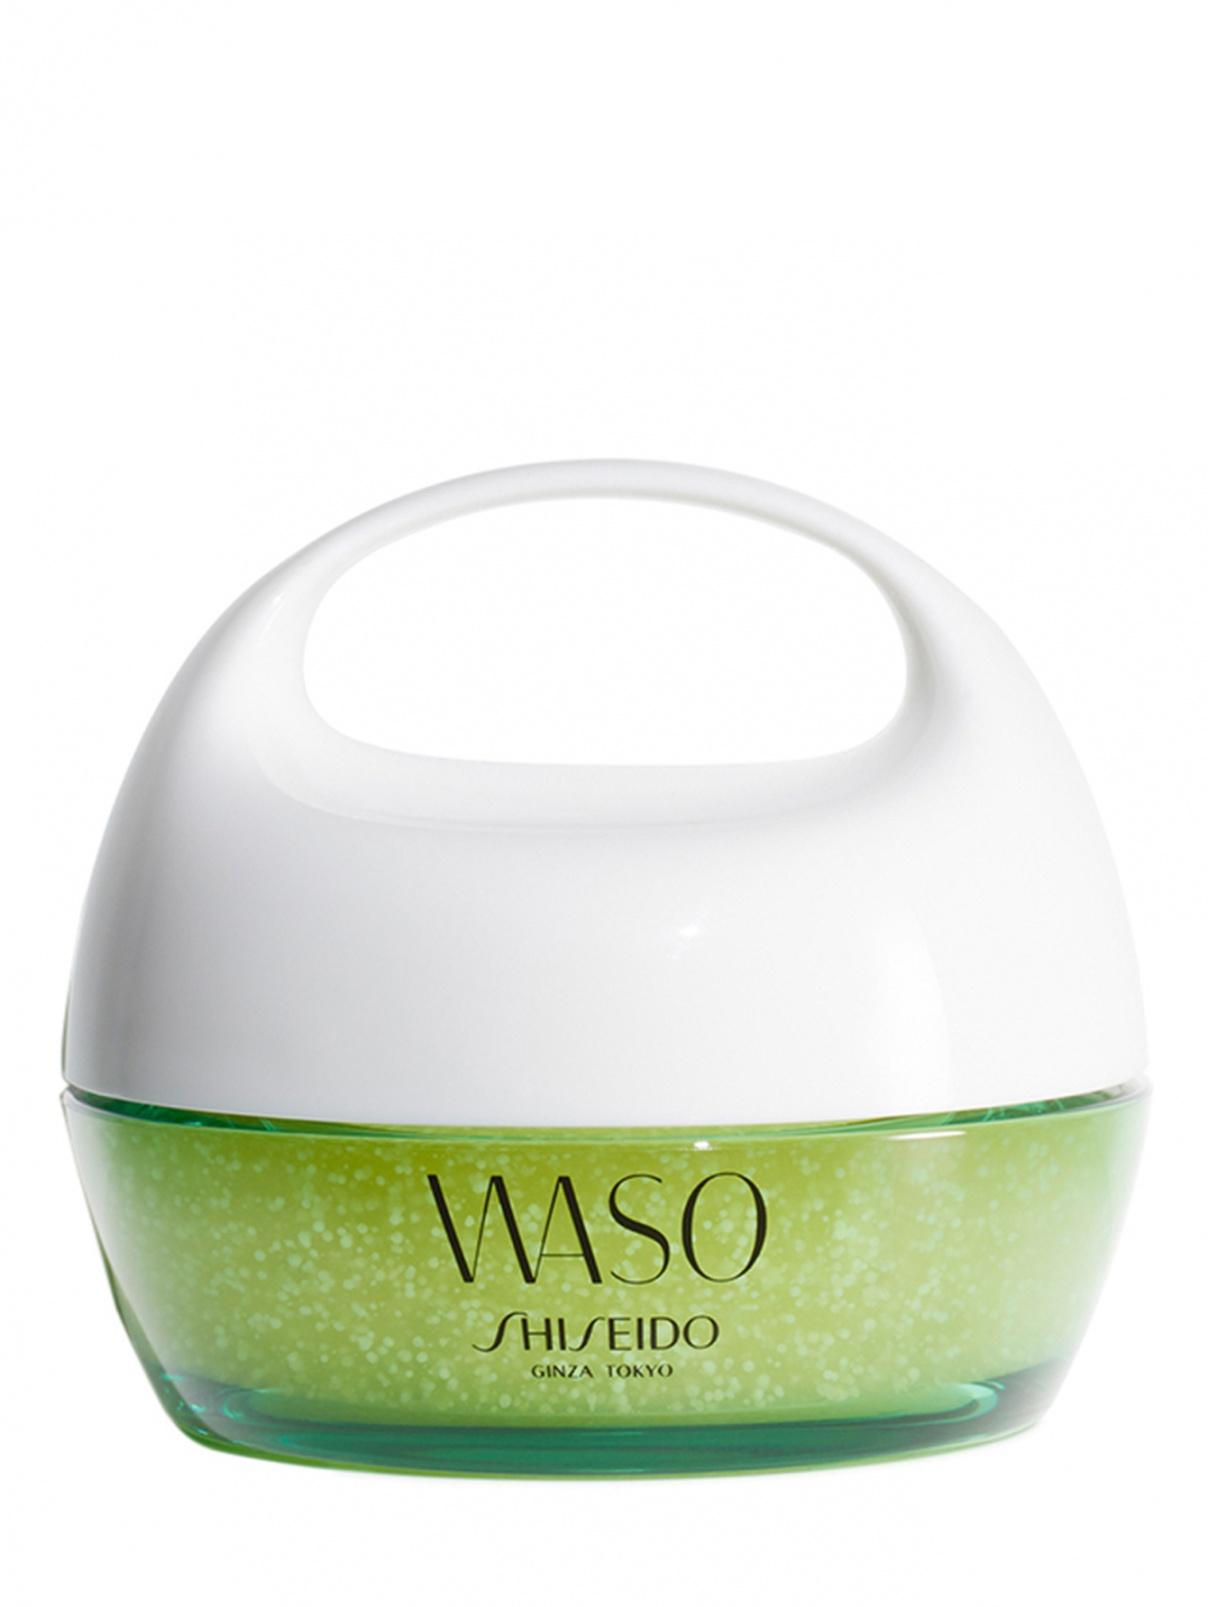 SHISEIDO WASO Ночная восстанавливающая маска, 80 мл Shiseido  –  Общий вид